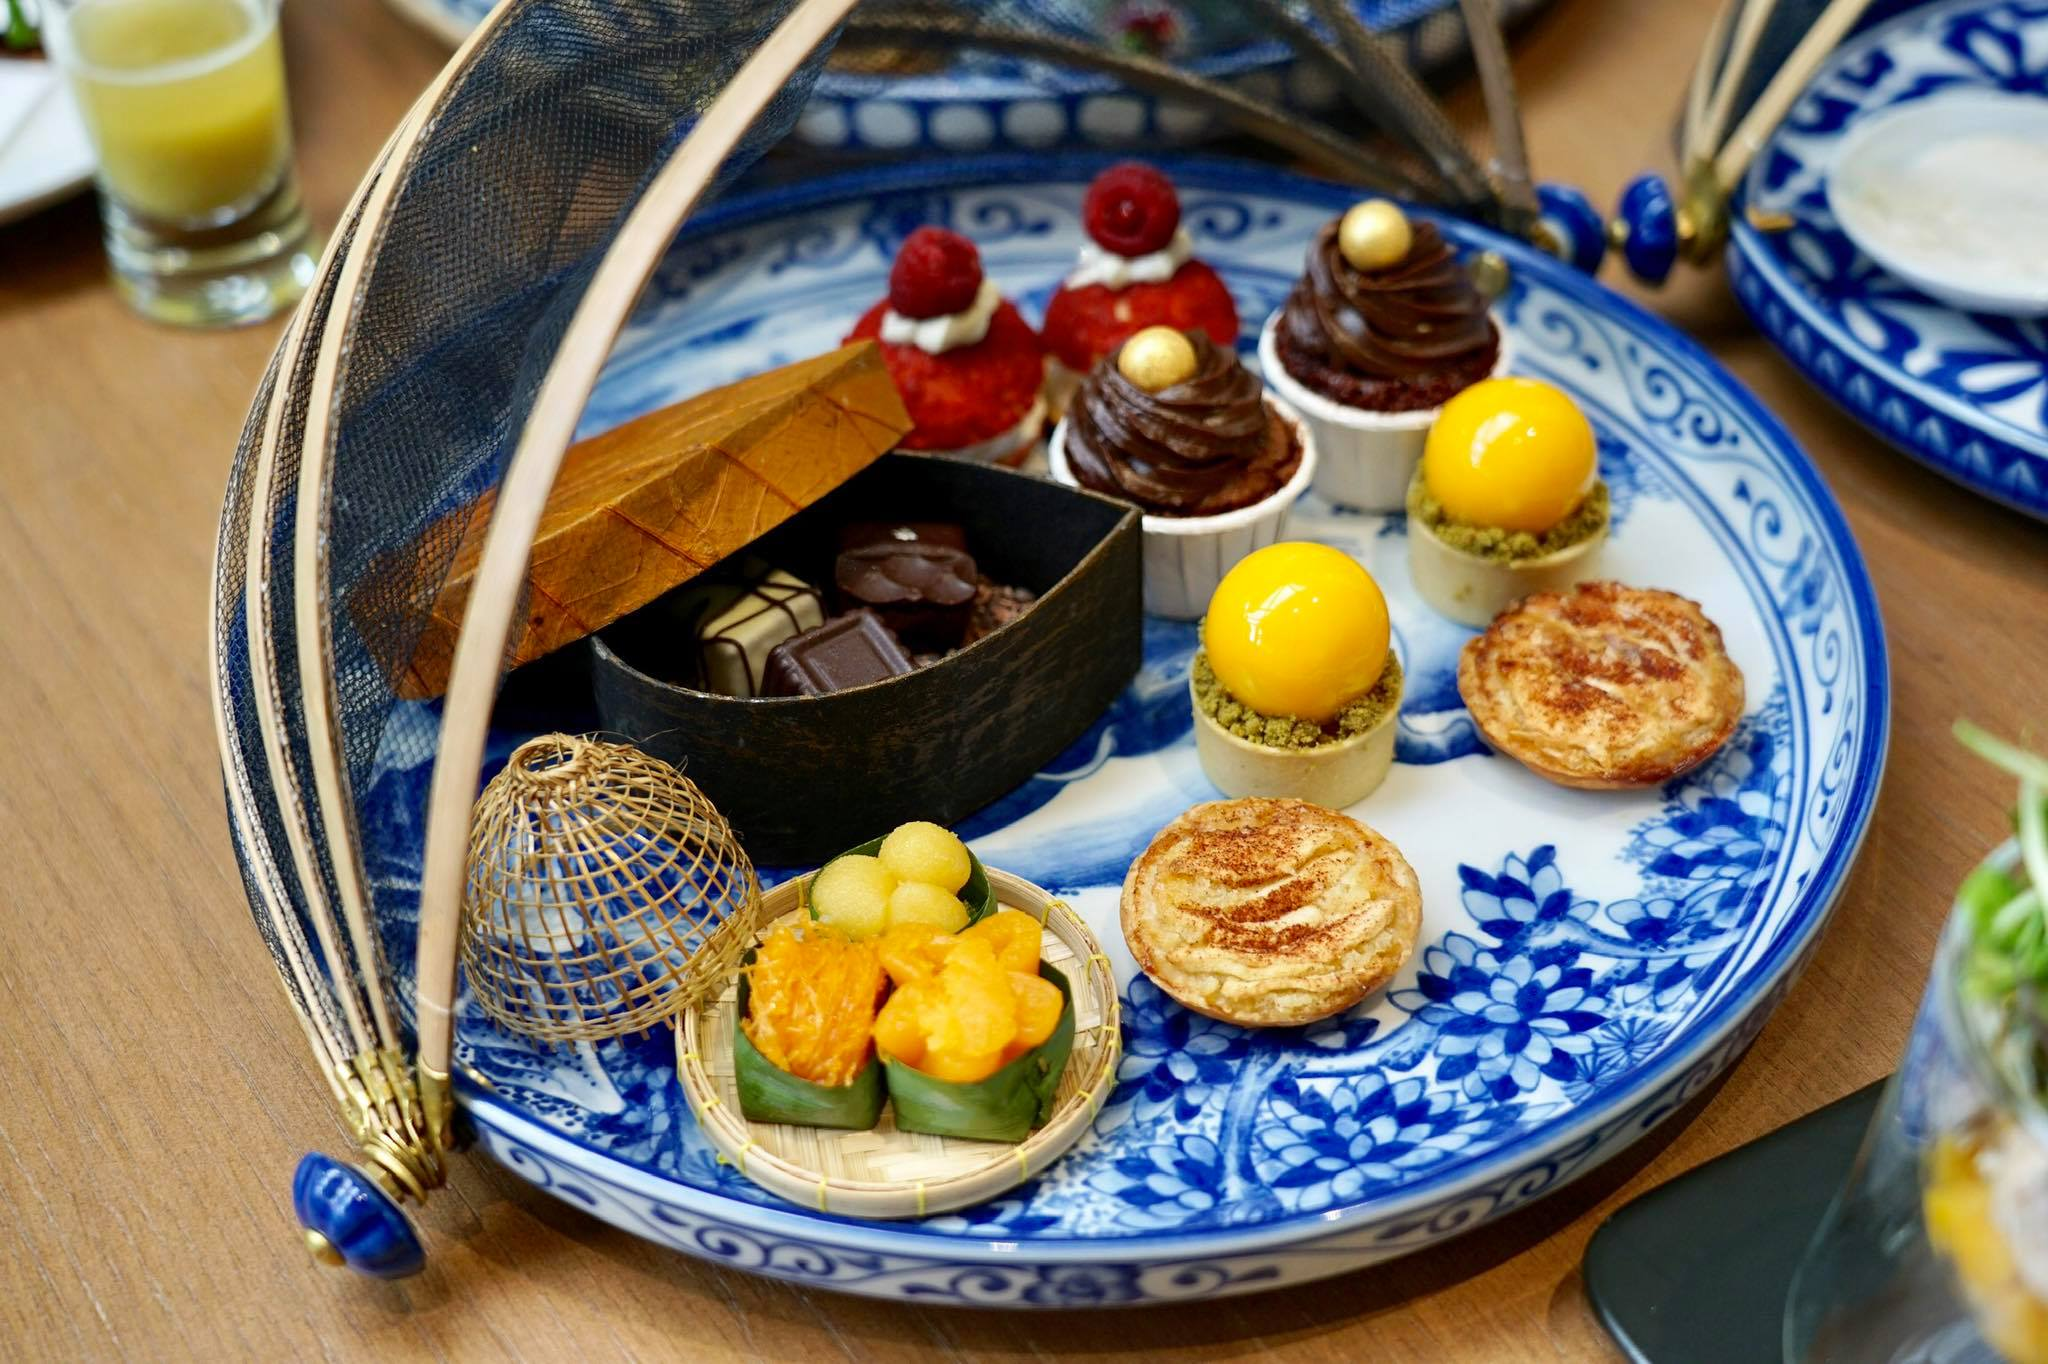 Guilt-free Afternoon Tea at Rim Klong Cafe